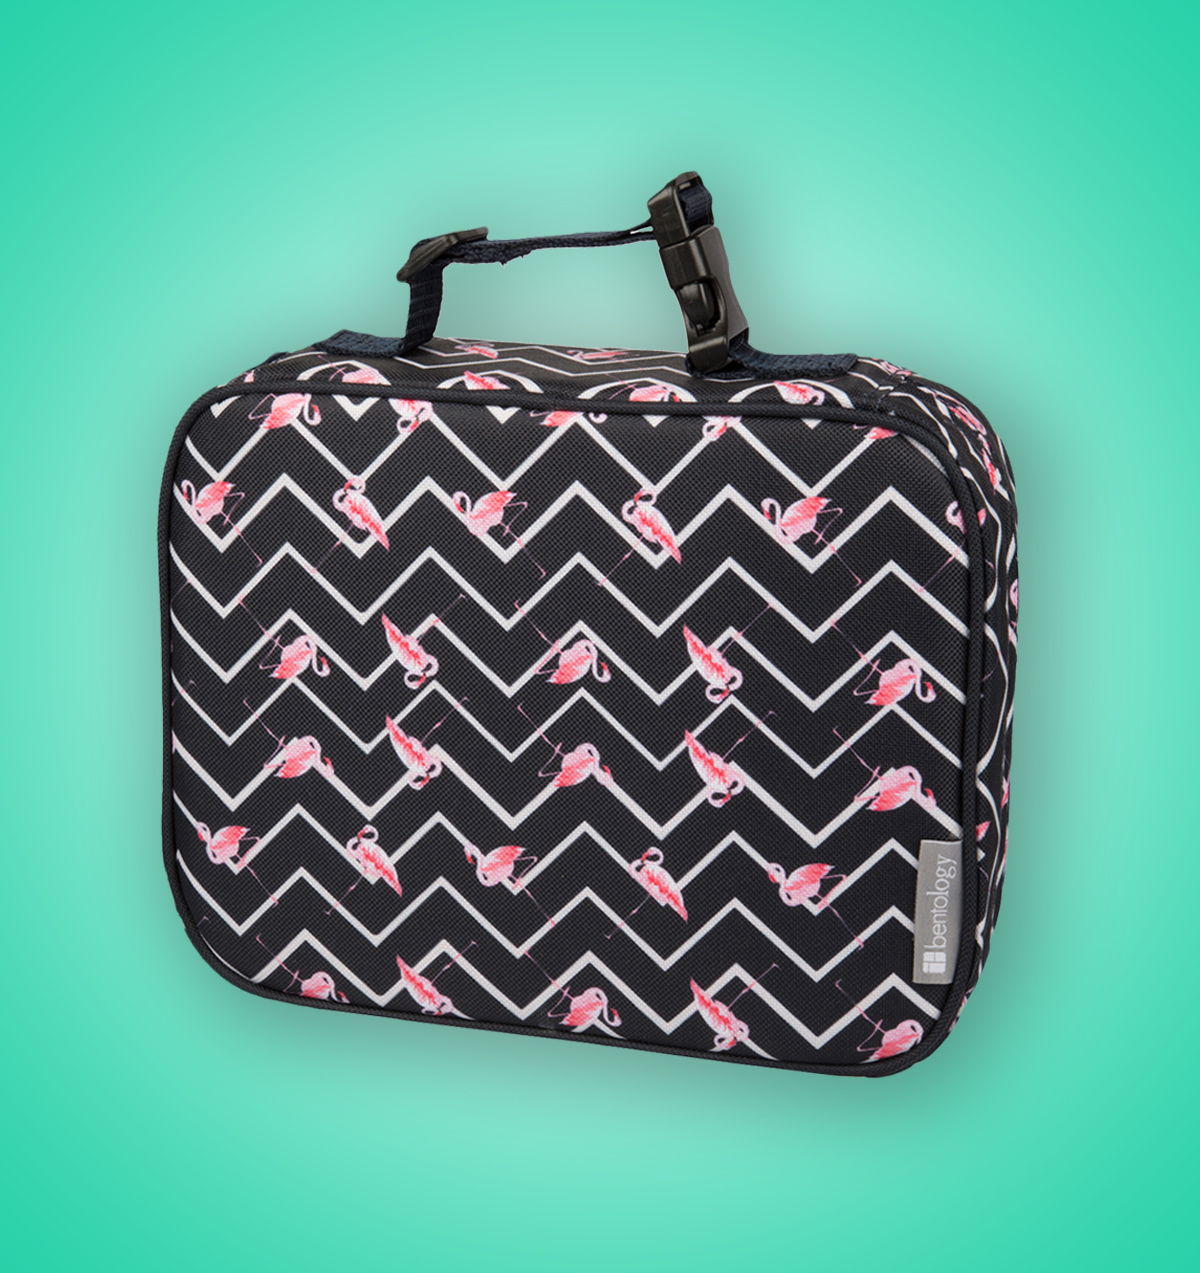 Bag Flamingo for Lunchbox